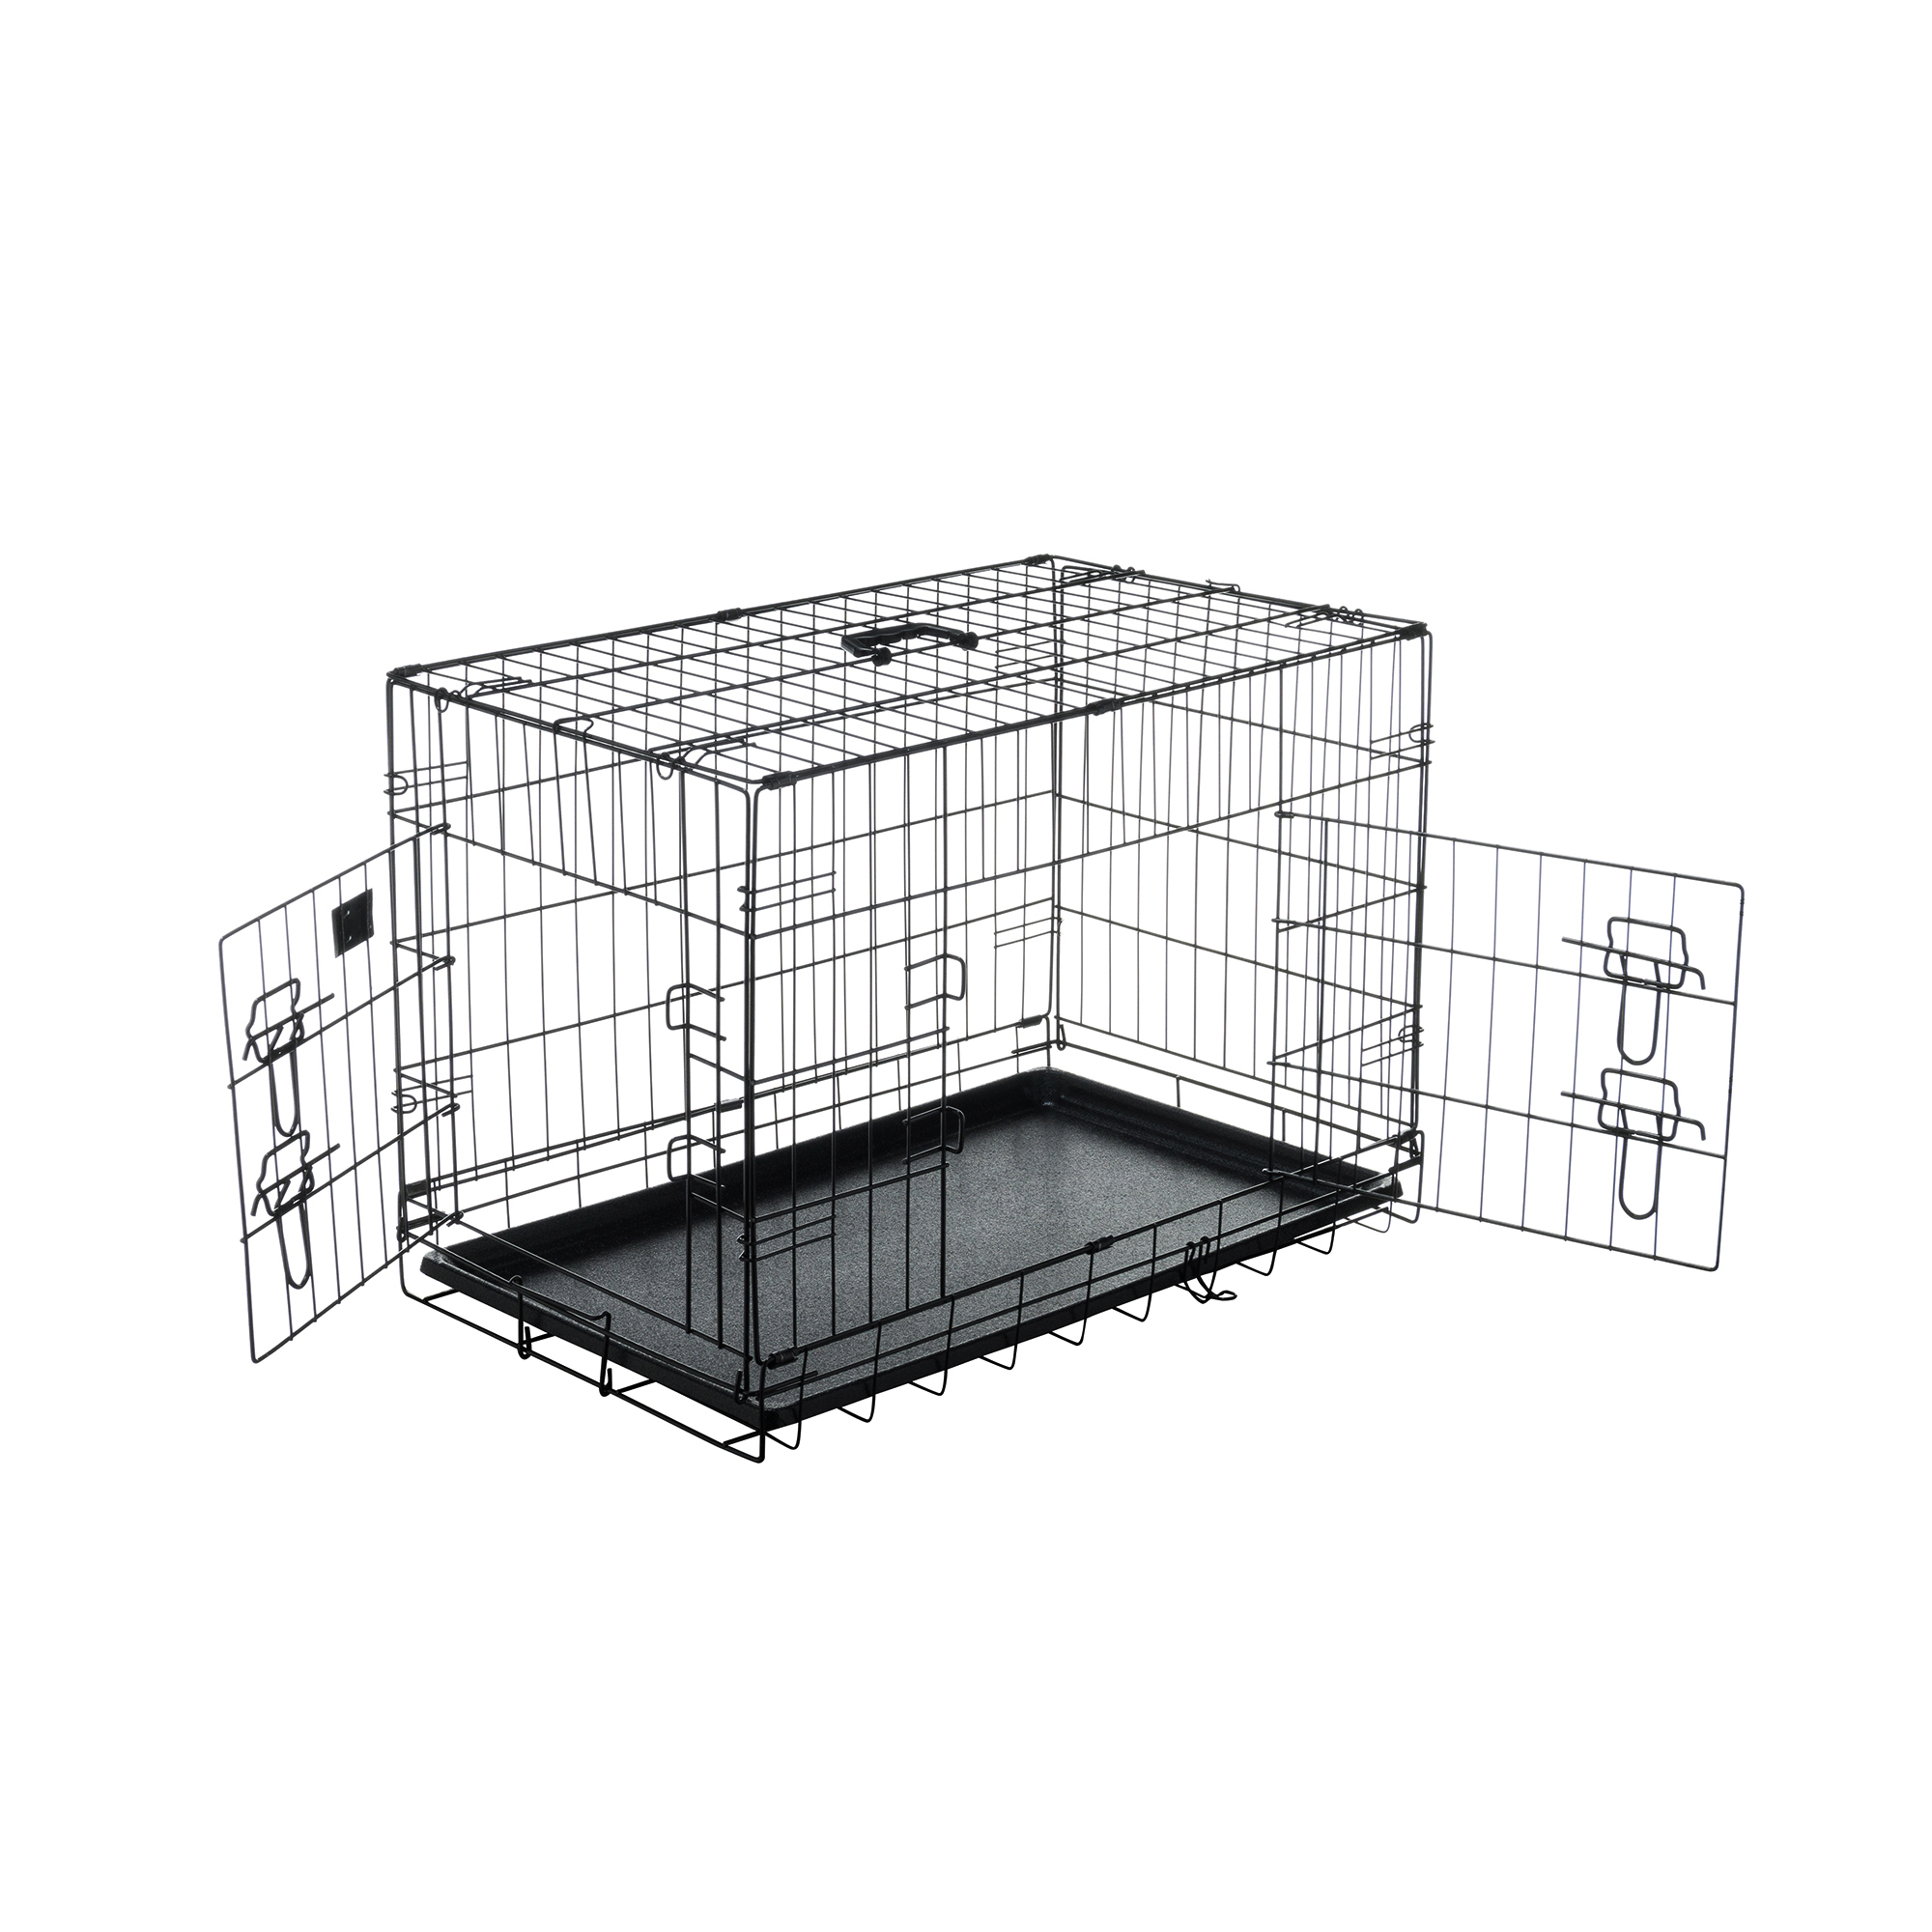 "Pet Trex 30 Inch Folding Pet Crate, 2 Door Animal Kennel, 30"" Dogs, Rabbits"